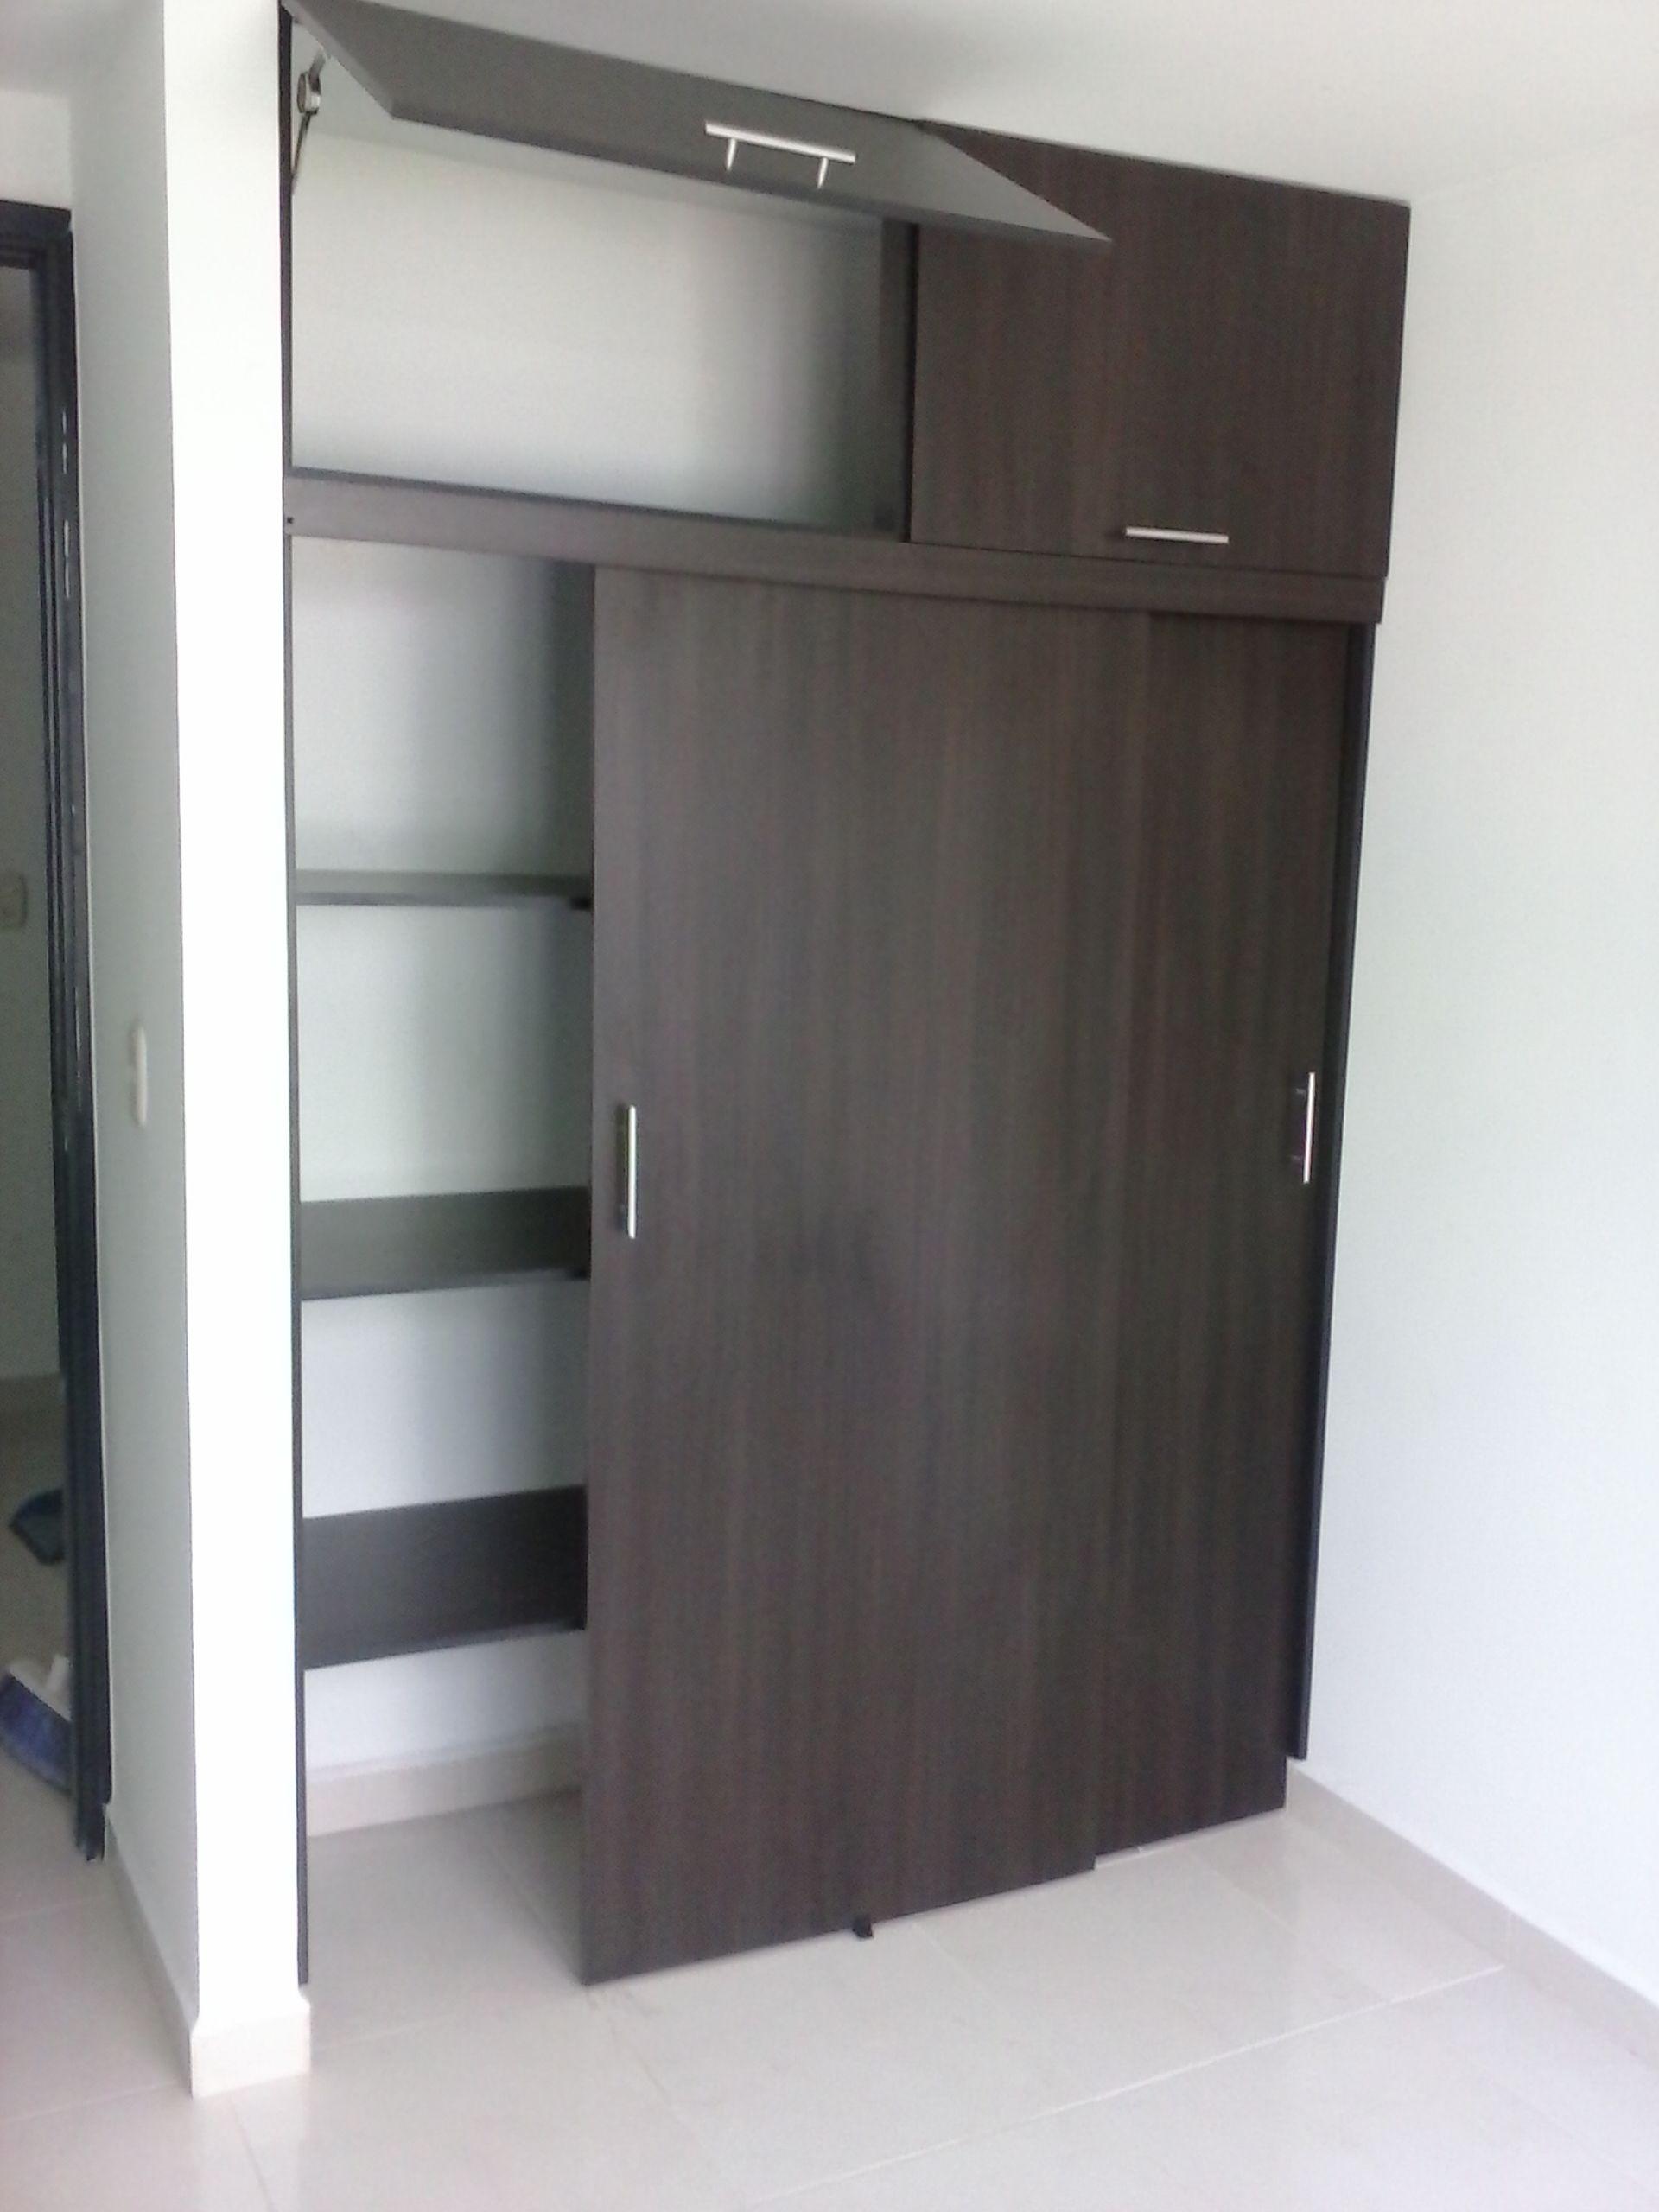 closet fitted furniture organizer wardrobe wardrobes plans built sliding your build own system corner pre in